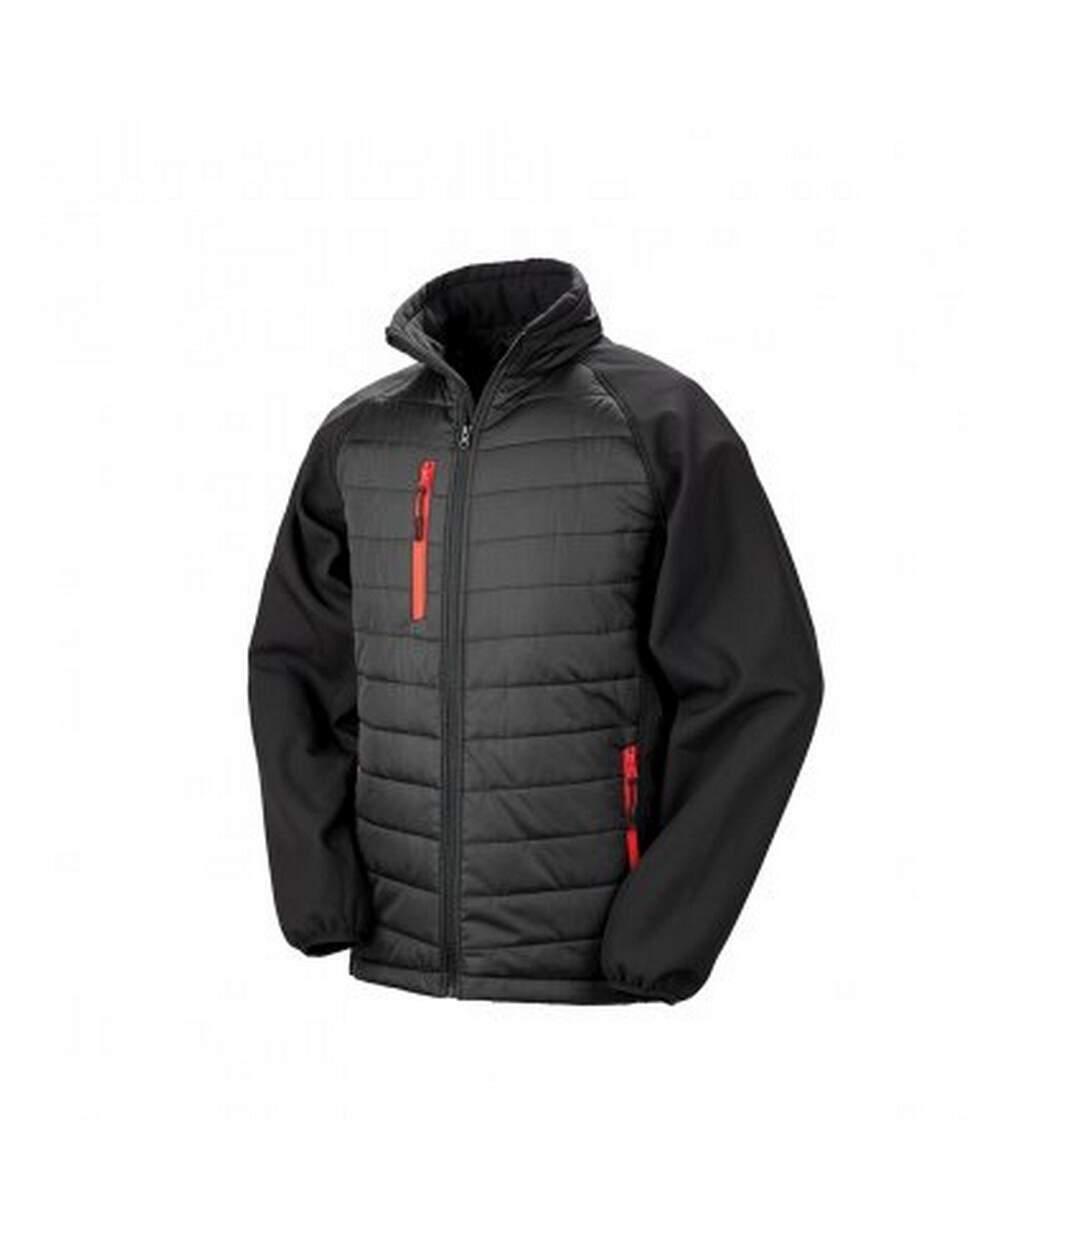 Result Mens Black Compass Padded Soft Shell Jacket (Black/Red) - UTPC3326